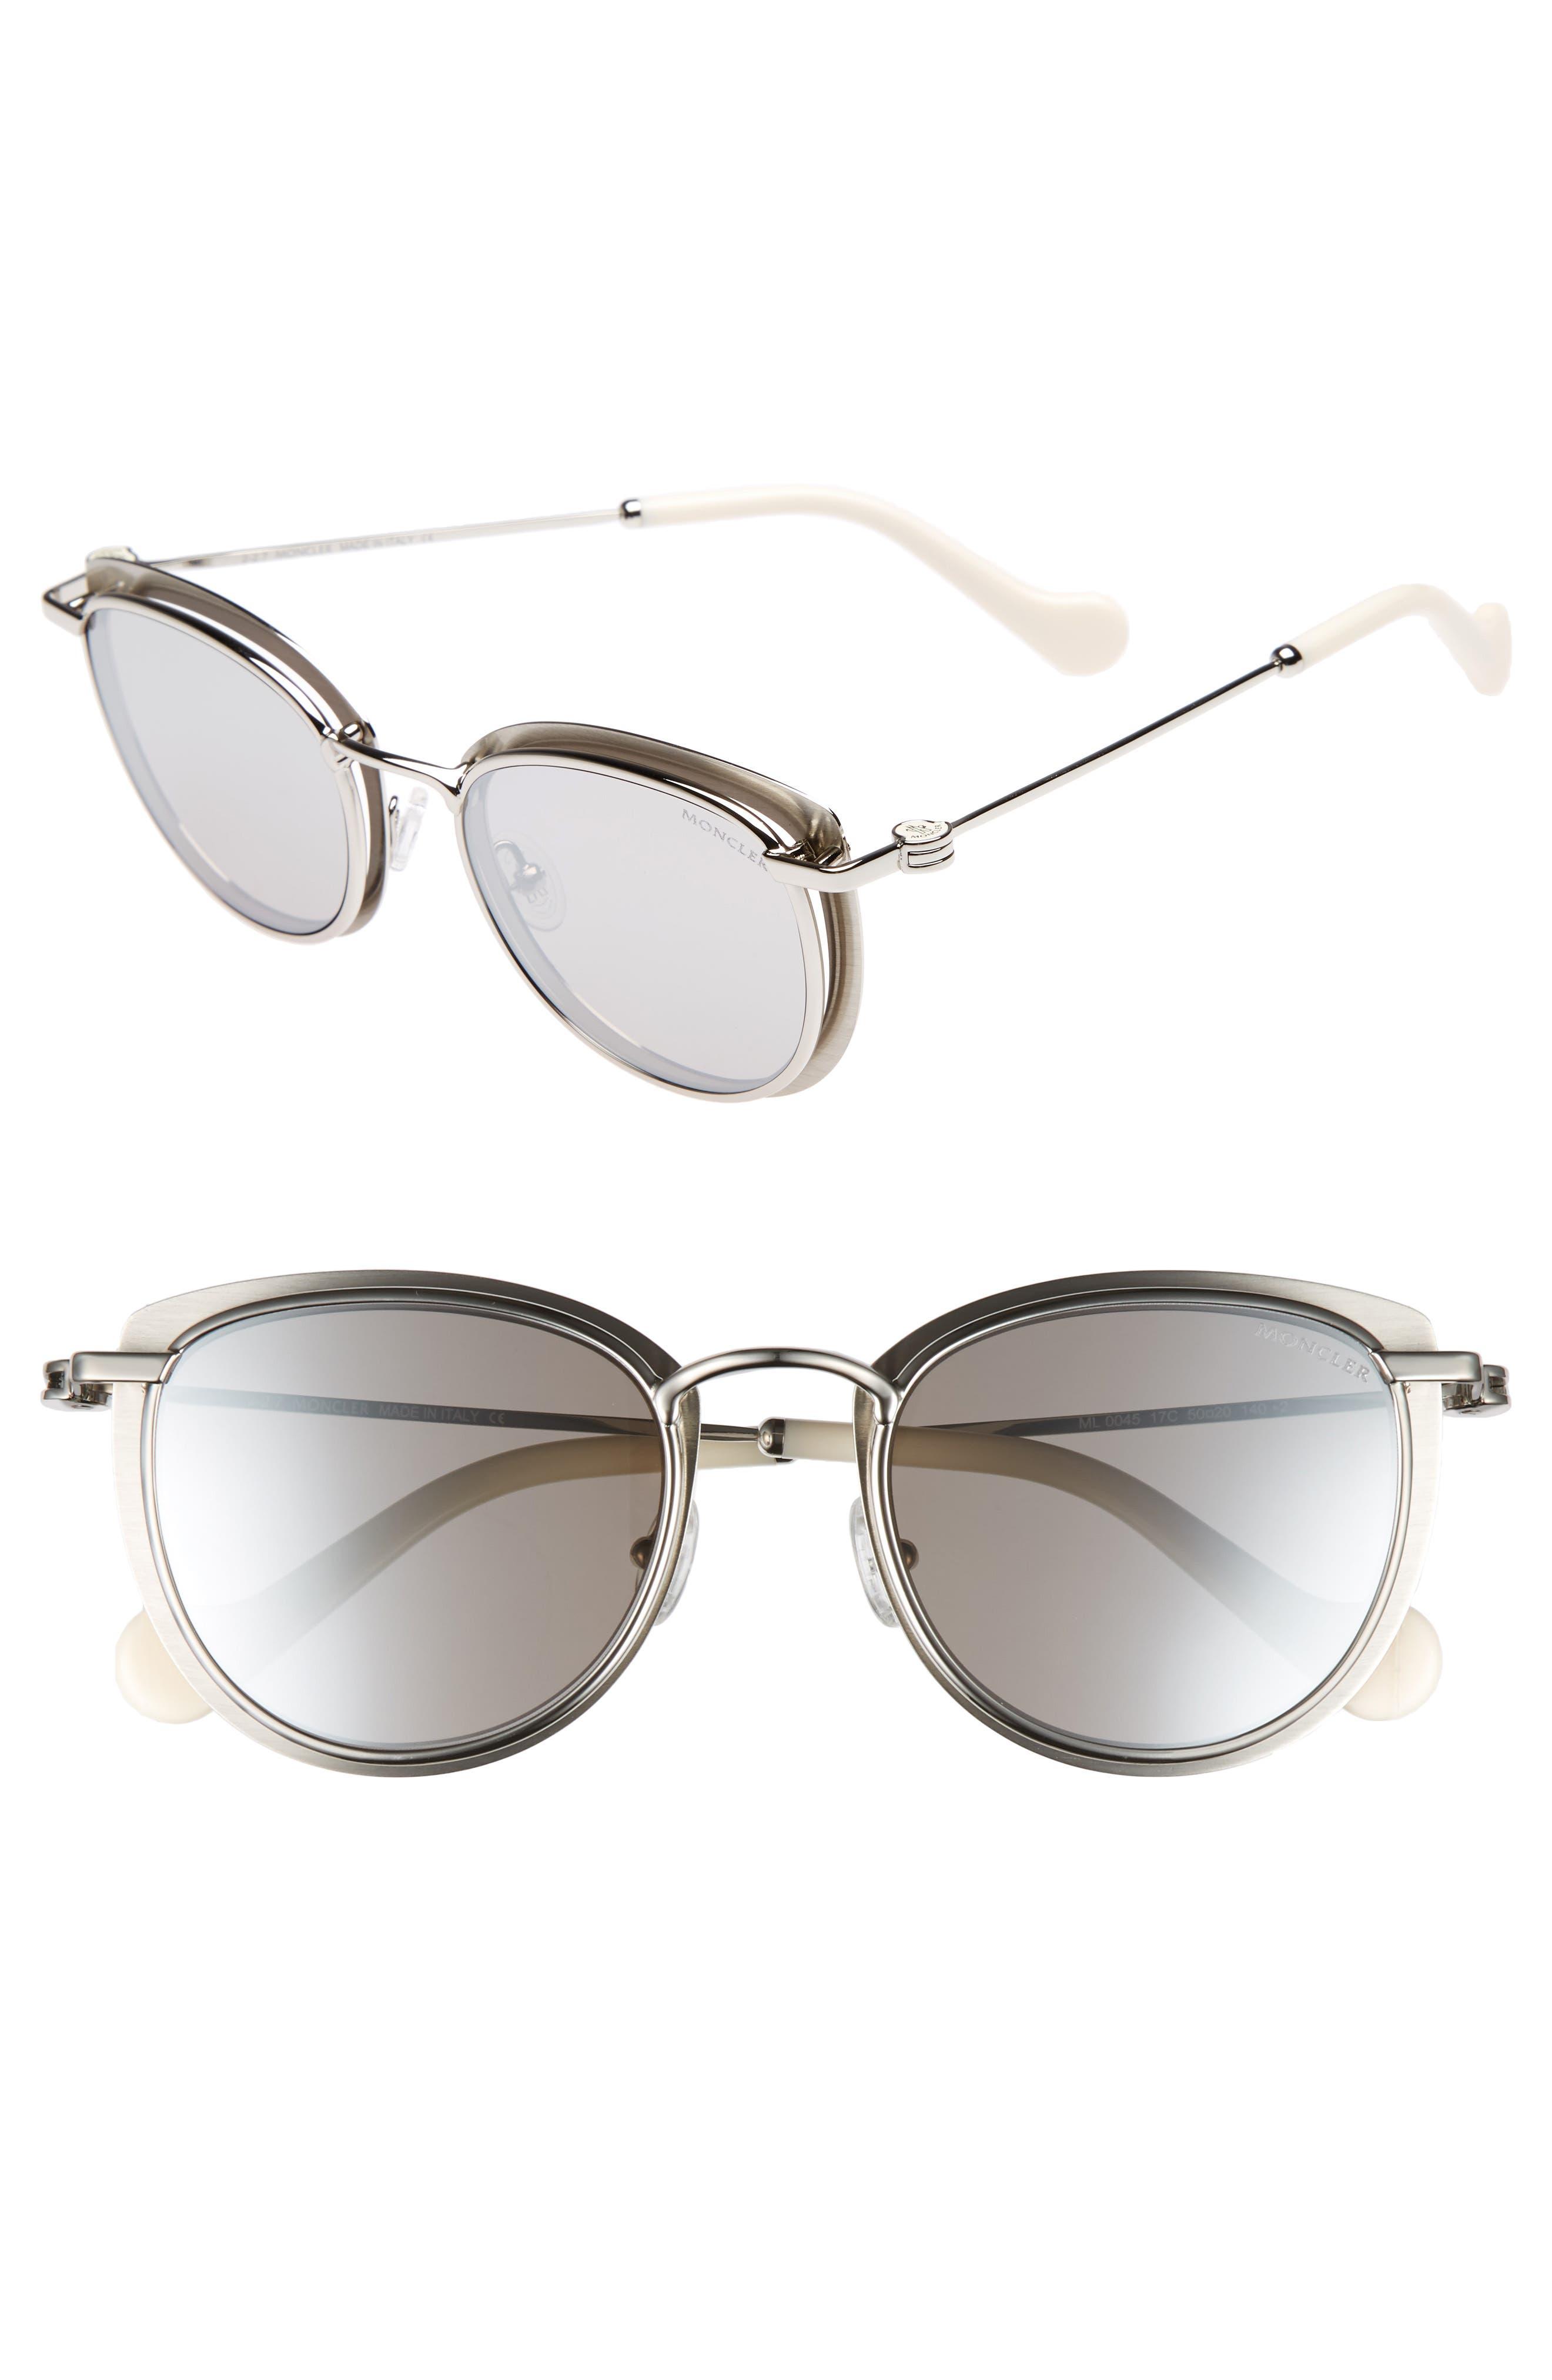 50mm Mirrored Geometric Sunglasses,                             Main thumbnail 1, color,                             PALADIUM/ WHITE/ SMOKE/ SILVER